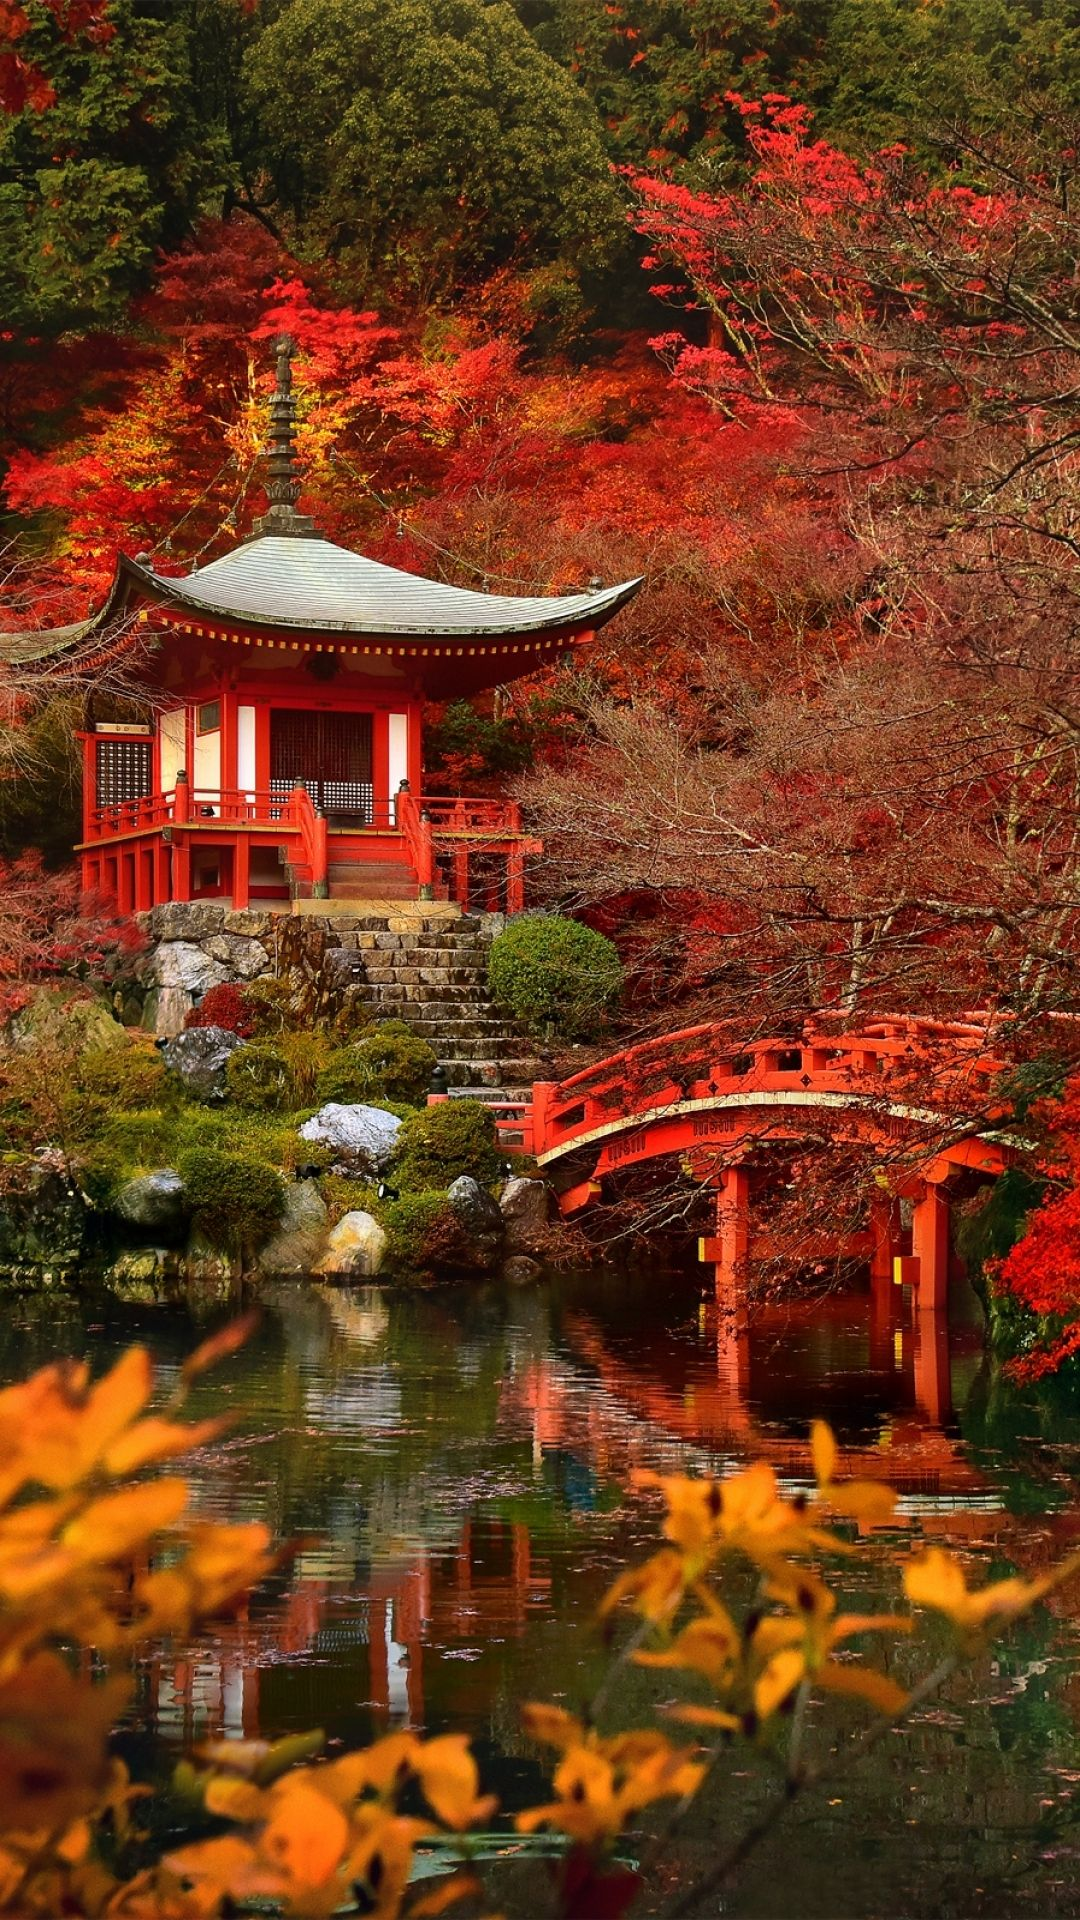 Japan Fall Colors Wallpaper Autumn In Japan Tap To See More Beautiful Nature